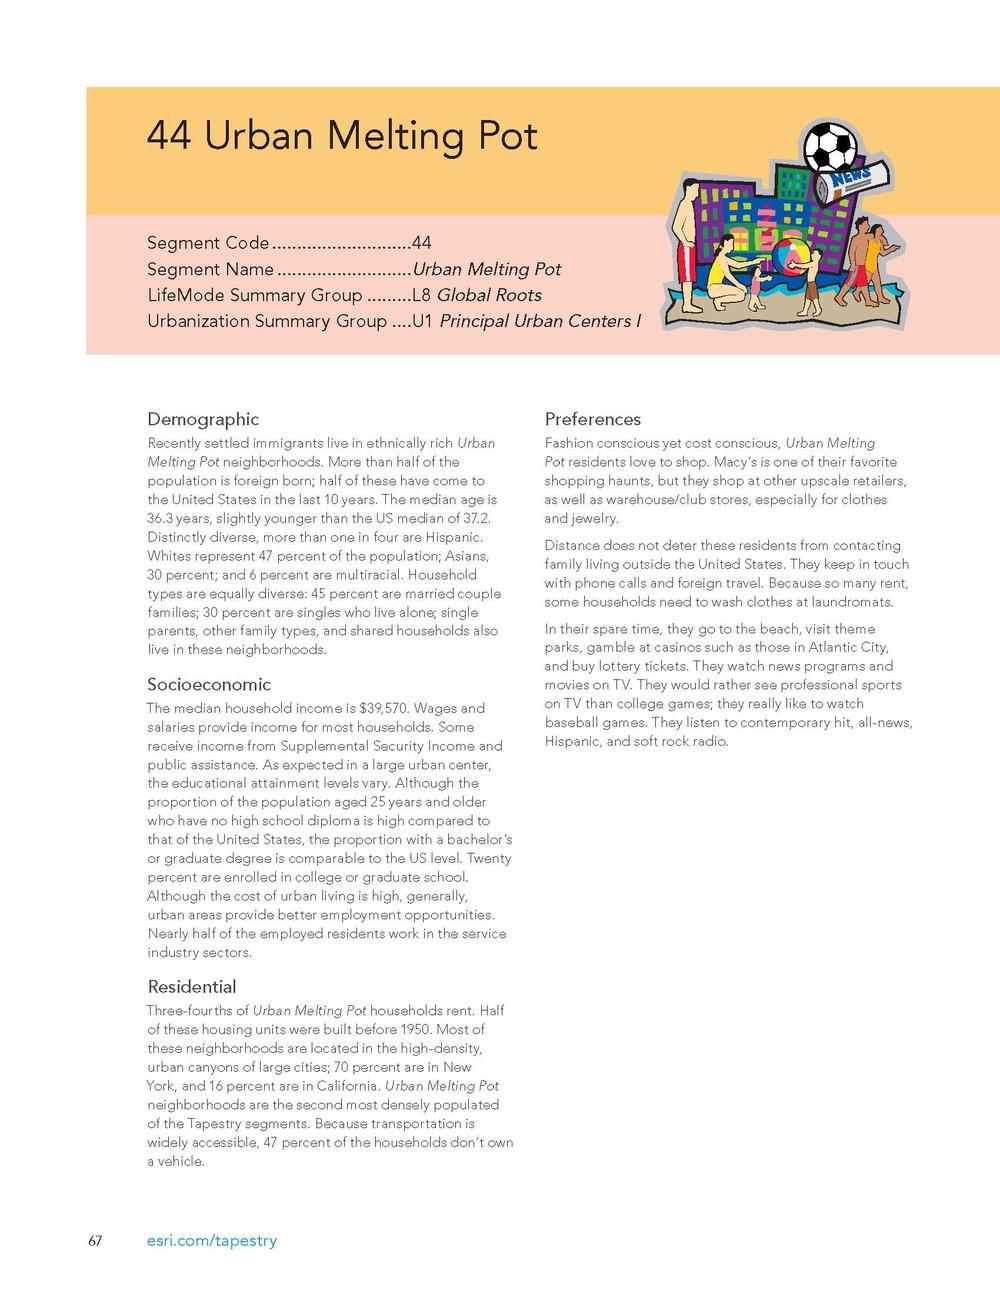 tapestry-segmentation_Page_70.jpg